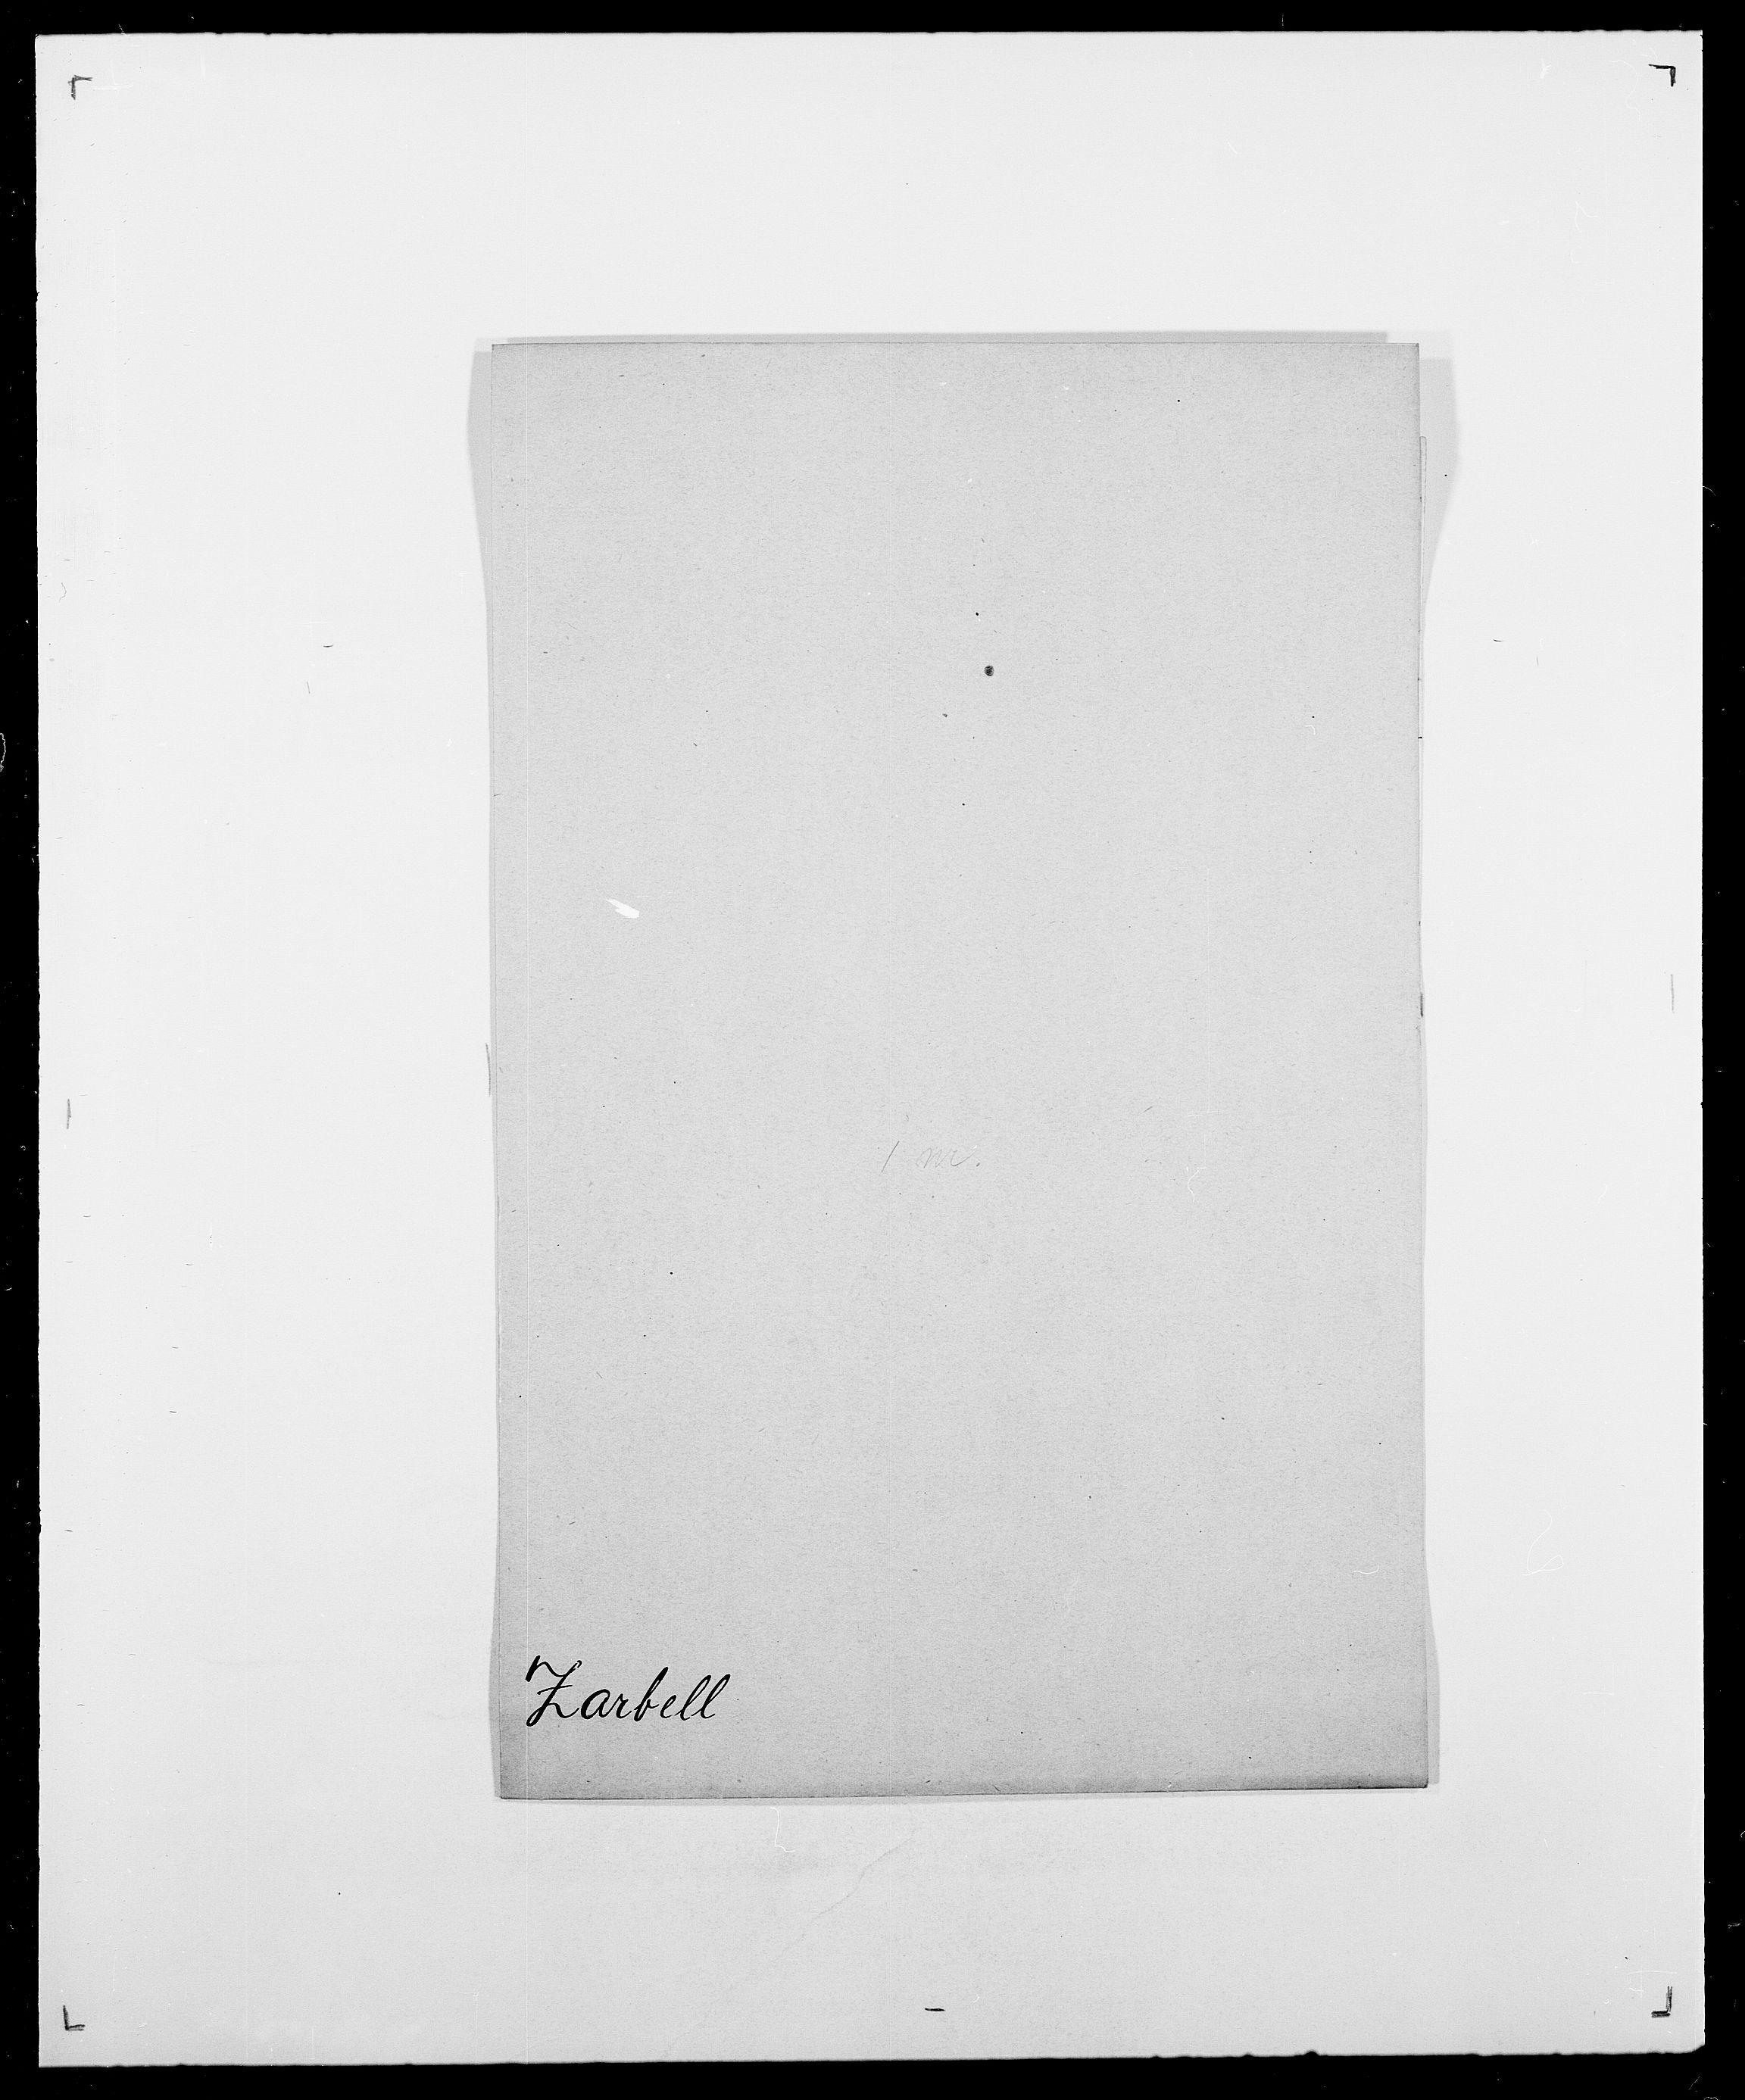 SAO, Delgobe, Charles Antoine - samling, D/Da/L0043: Wulfsberg - v. Zanten, s. 97